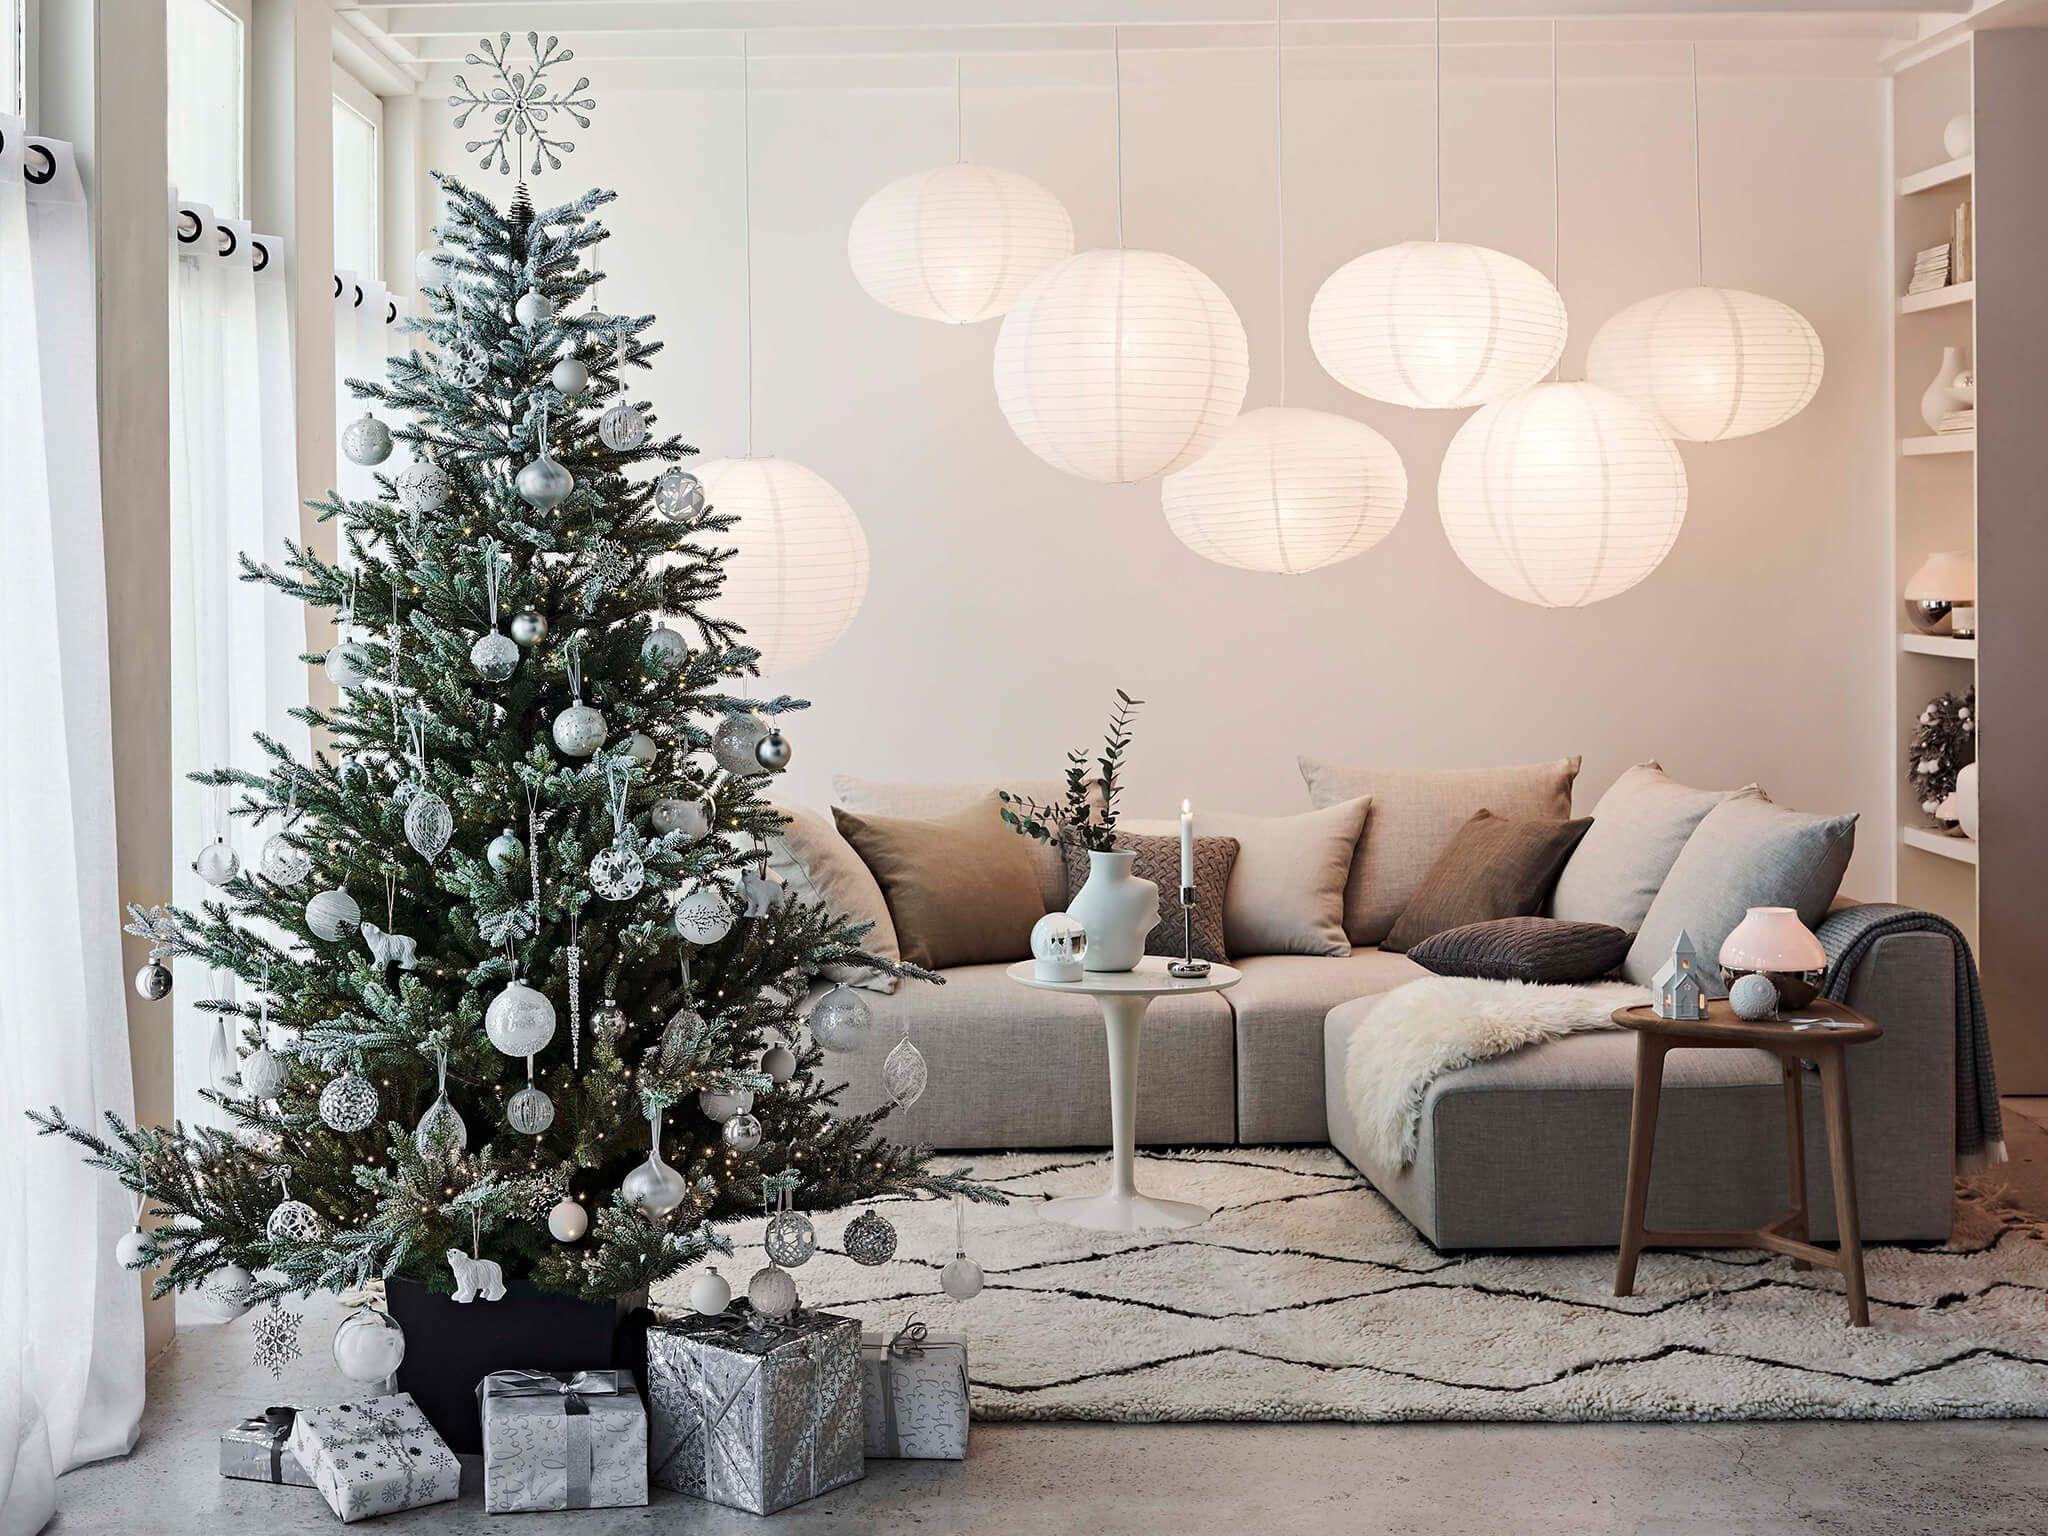 Christmas Decorating Trends Christmas Themes Decorations Trending Decor Christmas Tree Toppers Lighted